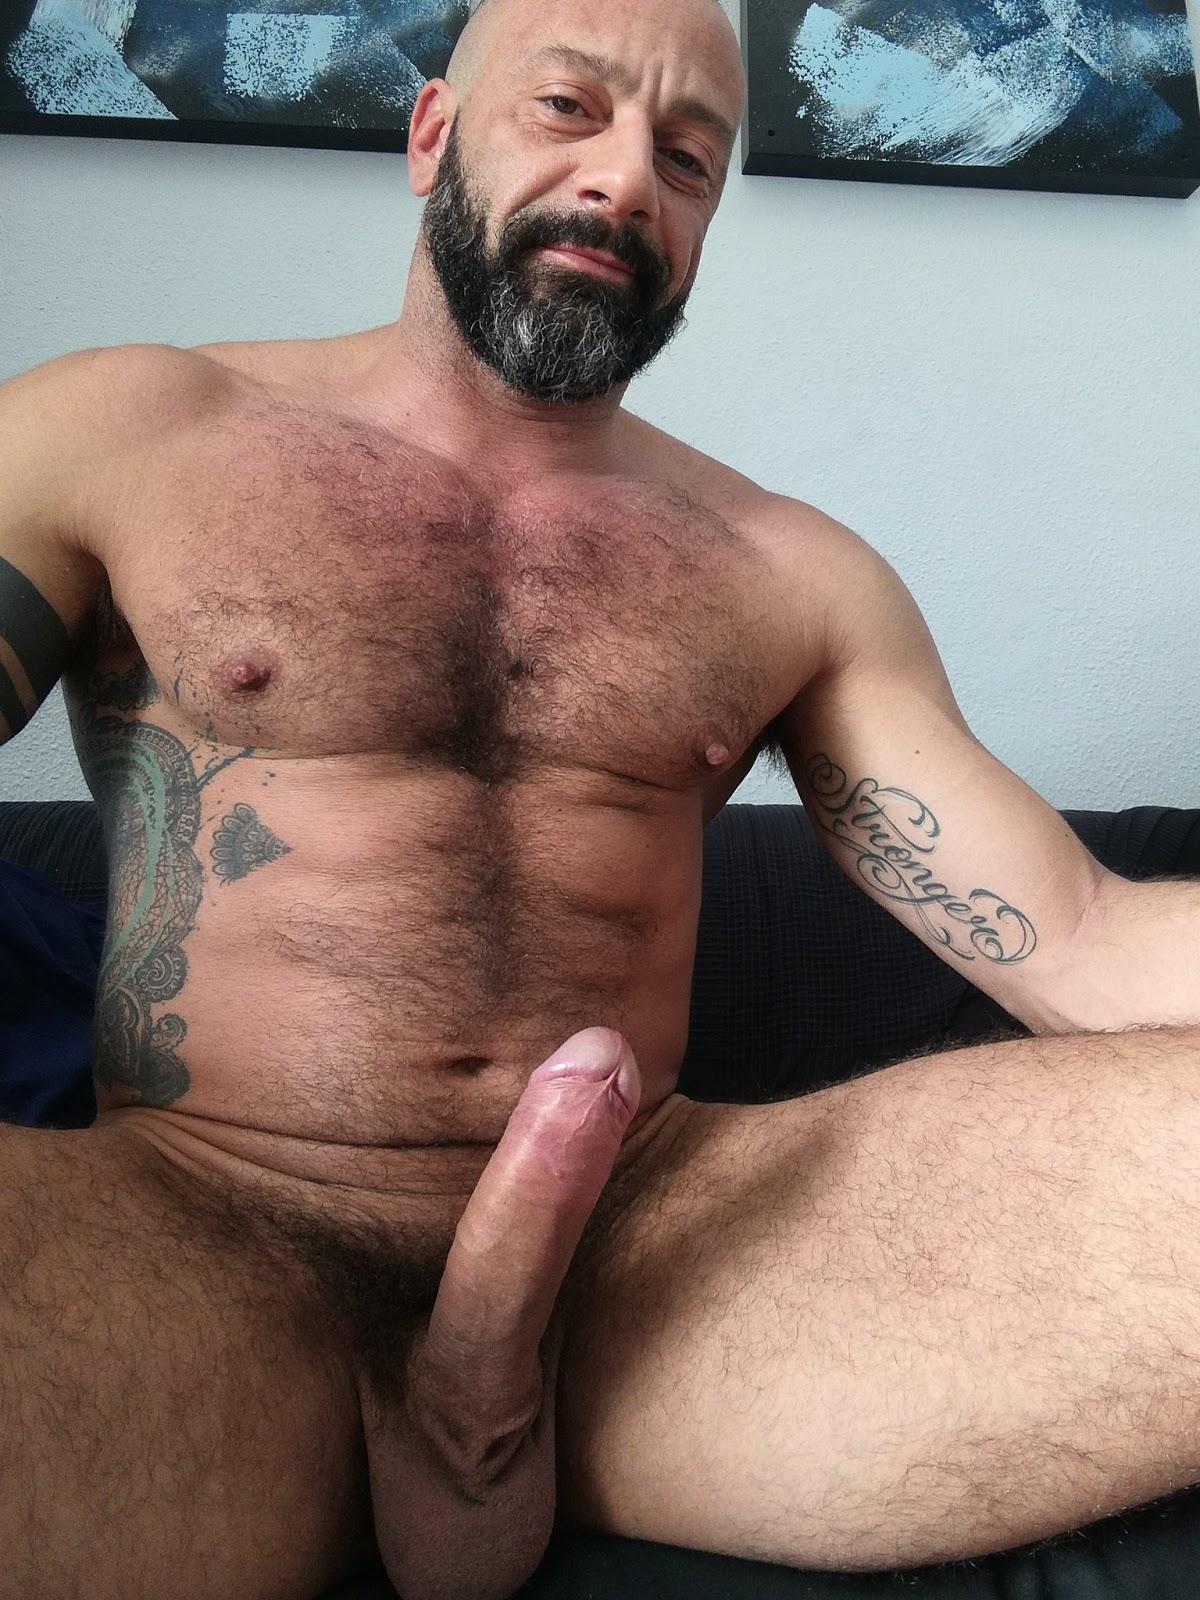 Penis bush